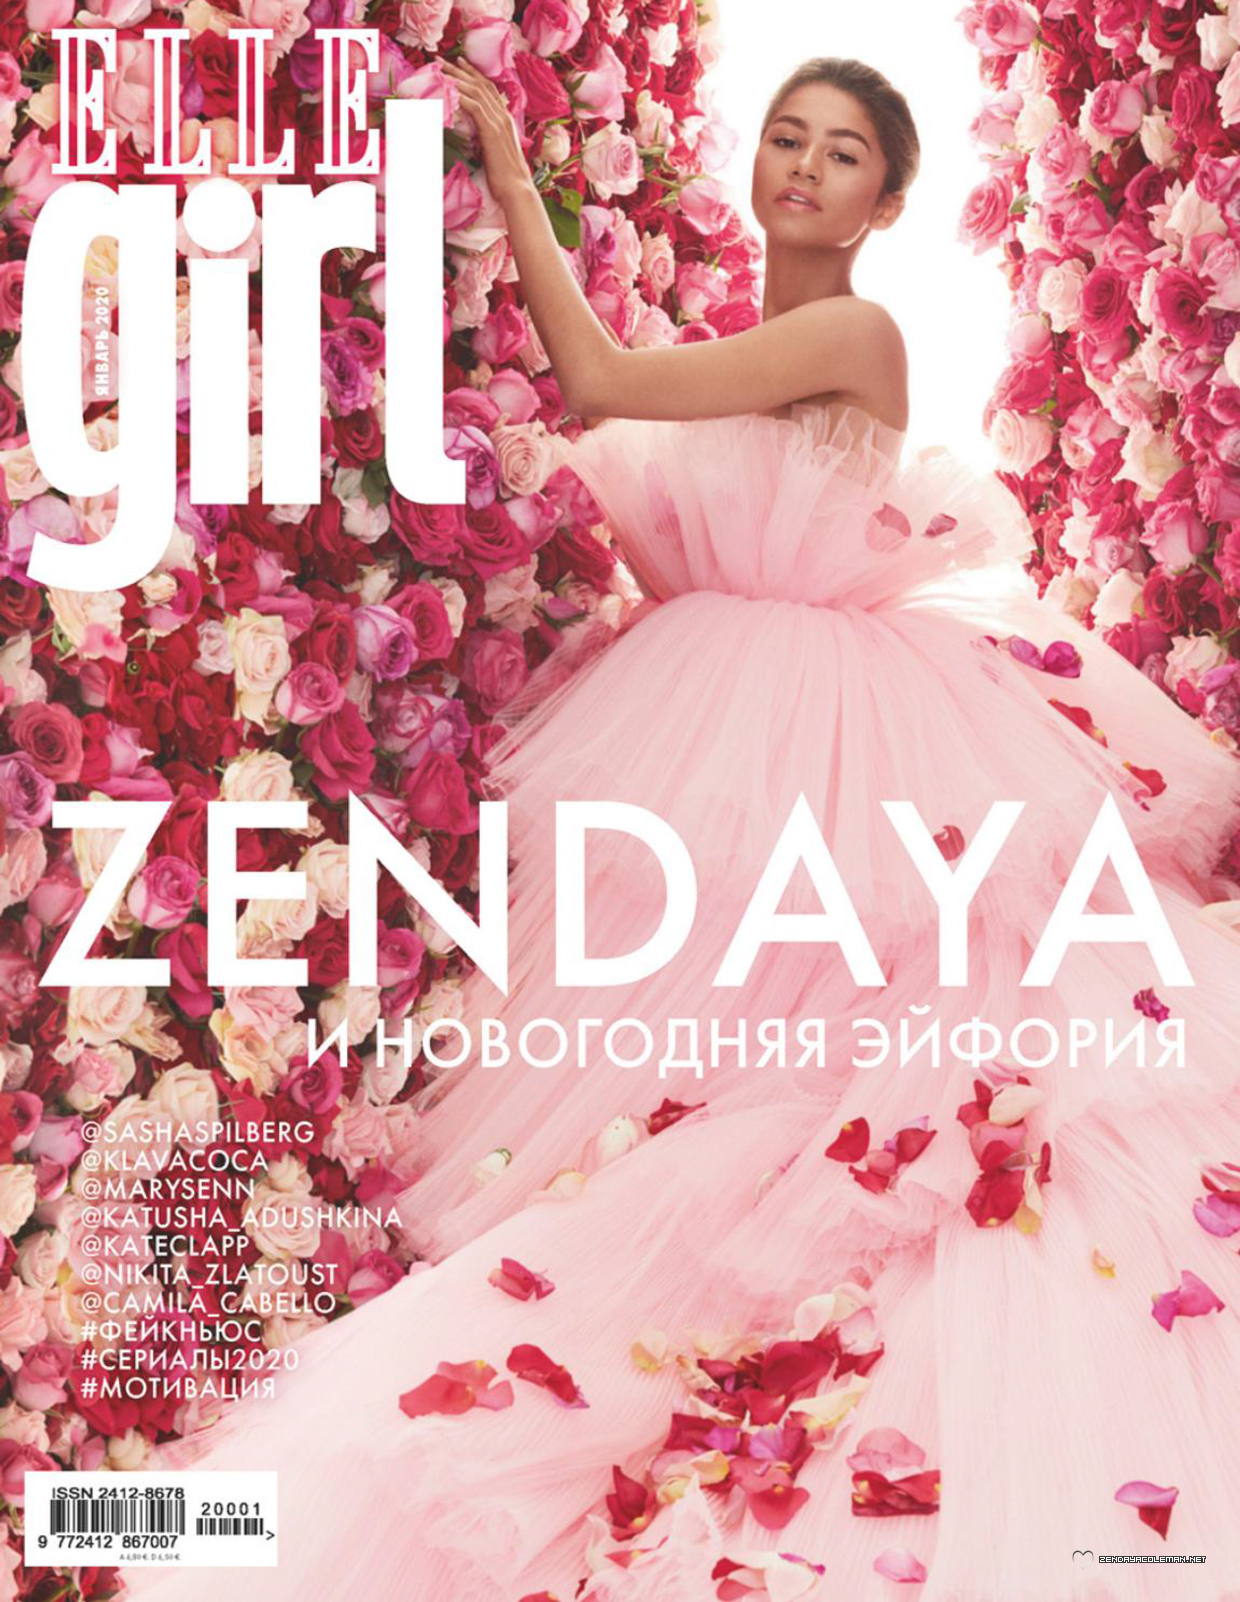 Press/Photos: 'Elle Girl' Russia Scans + Endorsements